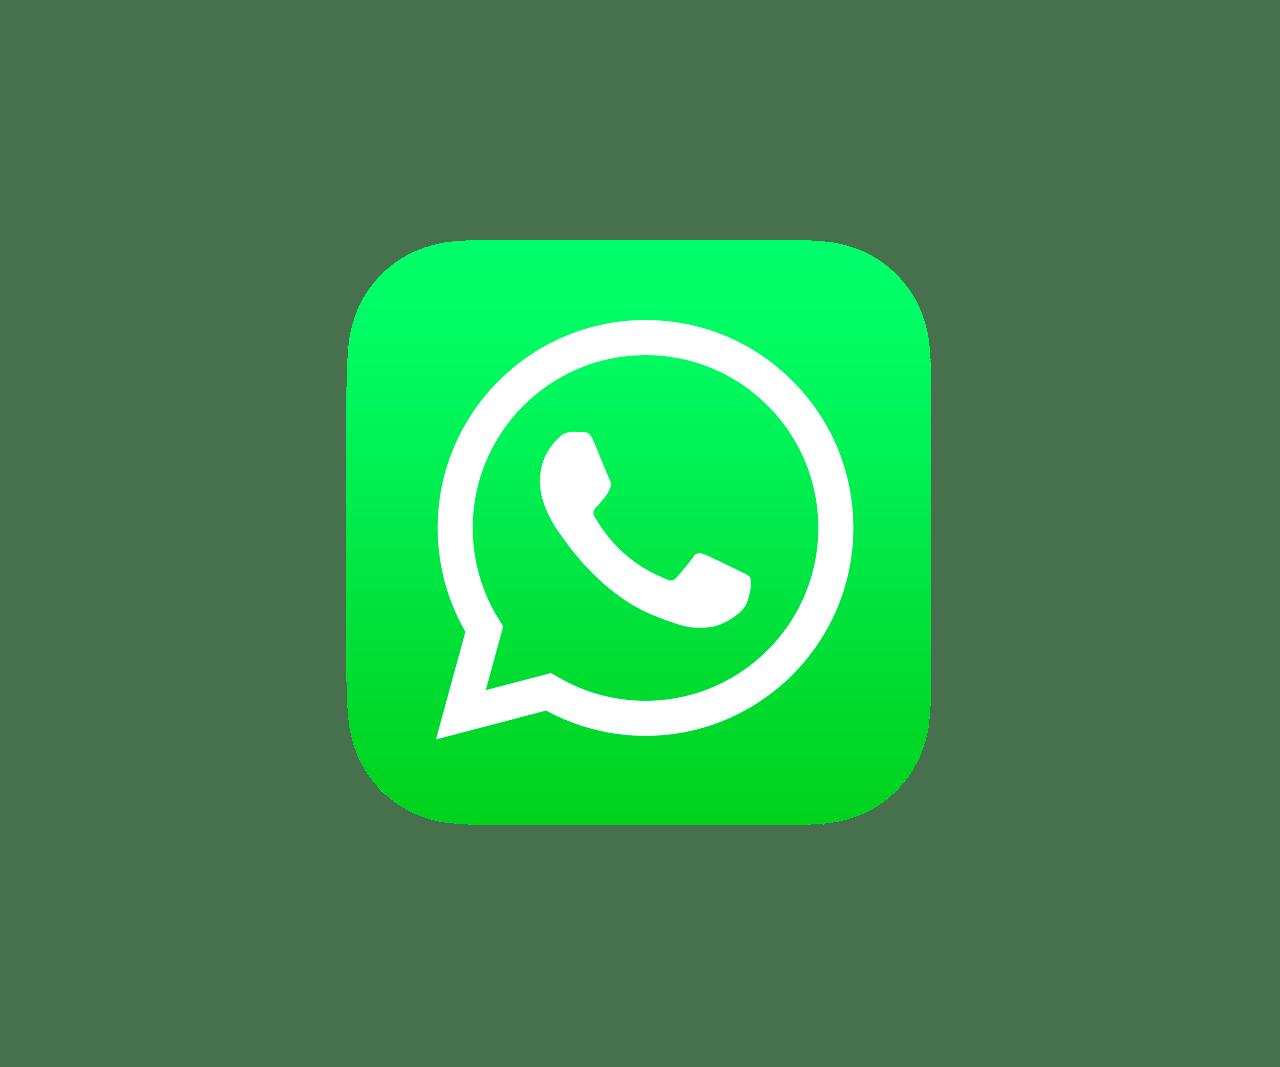 Whatsapp Ios Icono PNG transparente - StickPNG